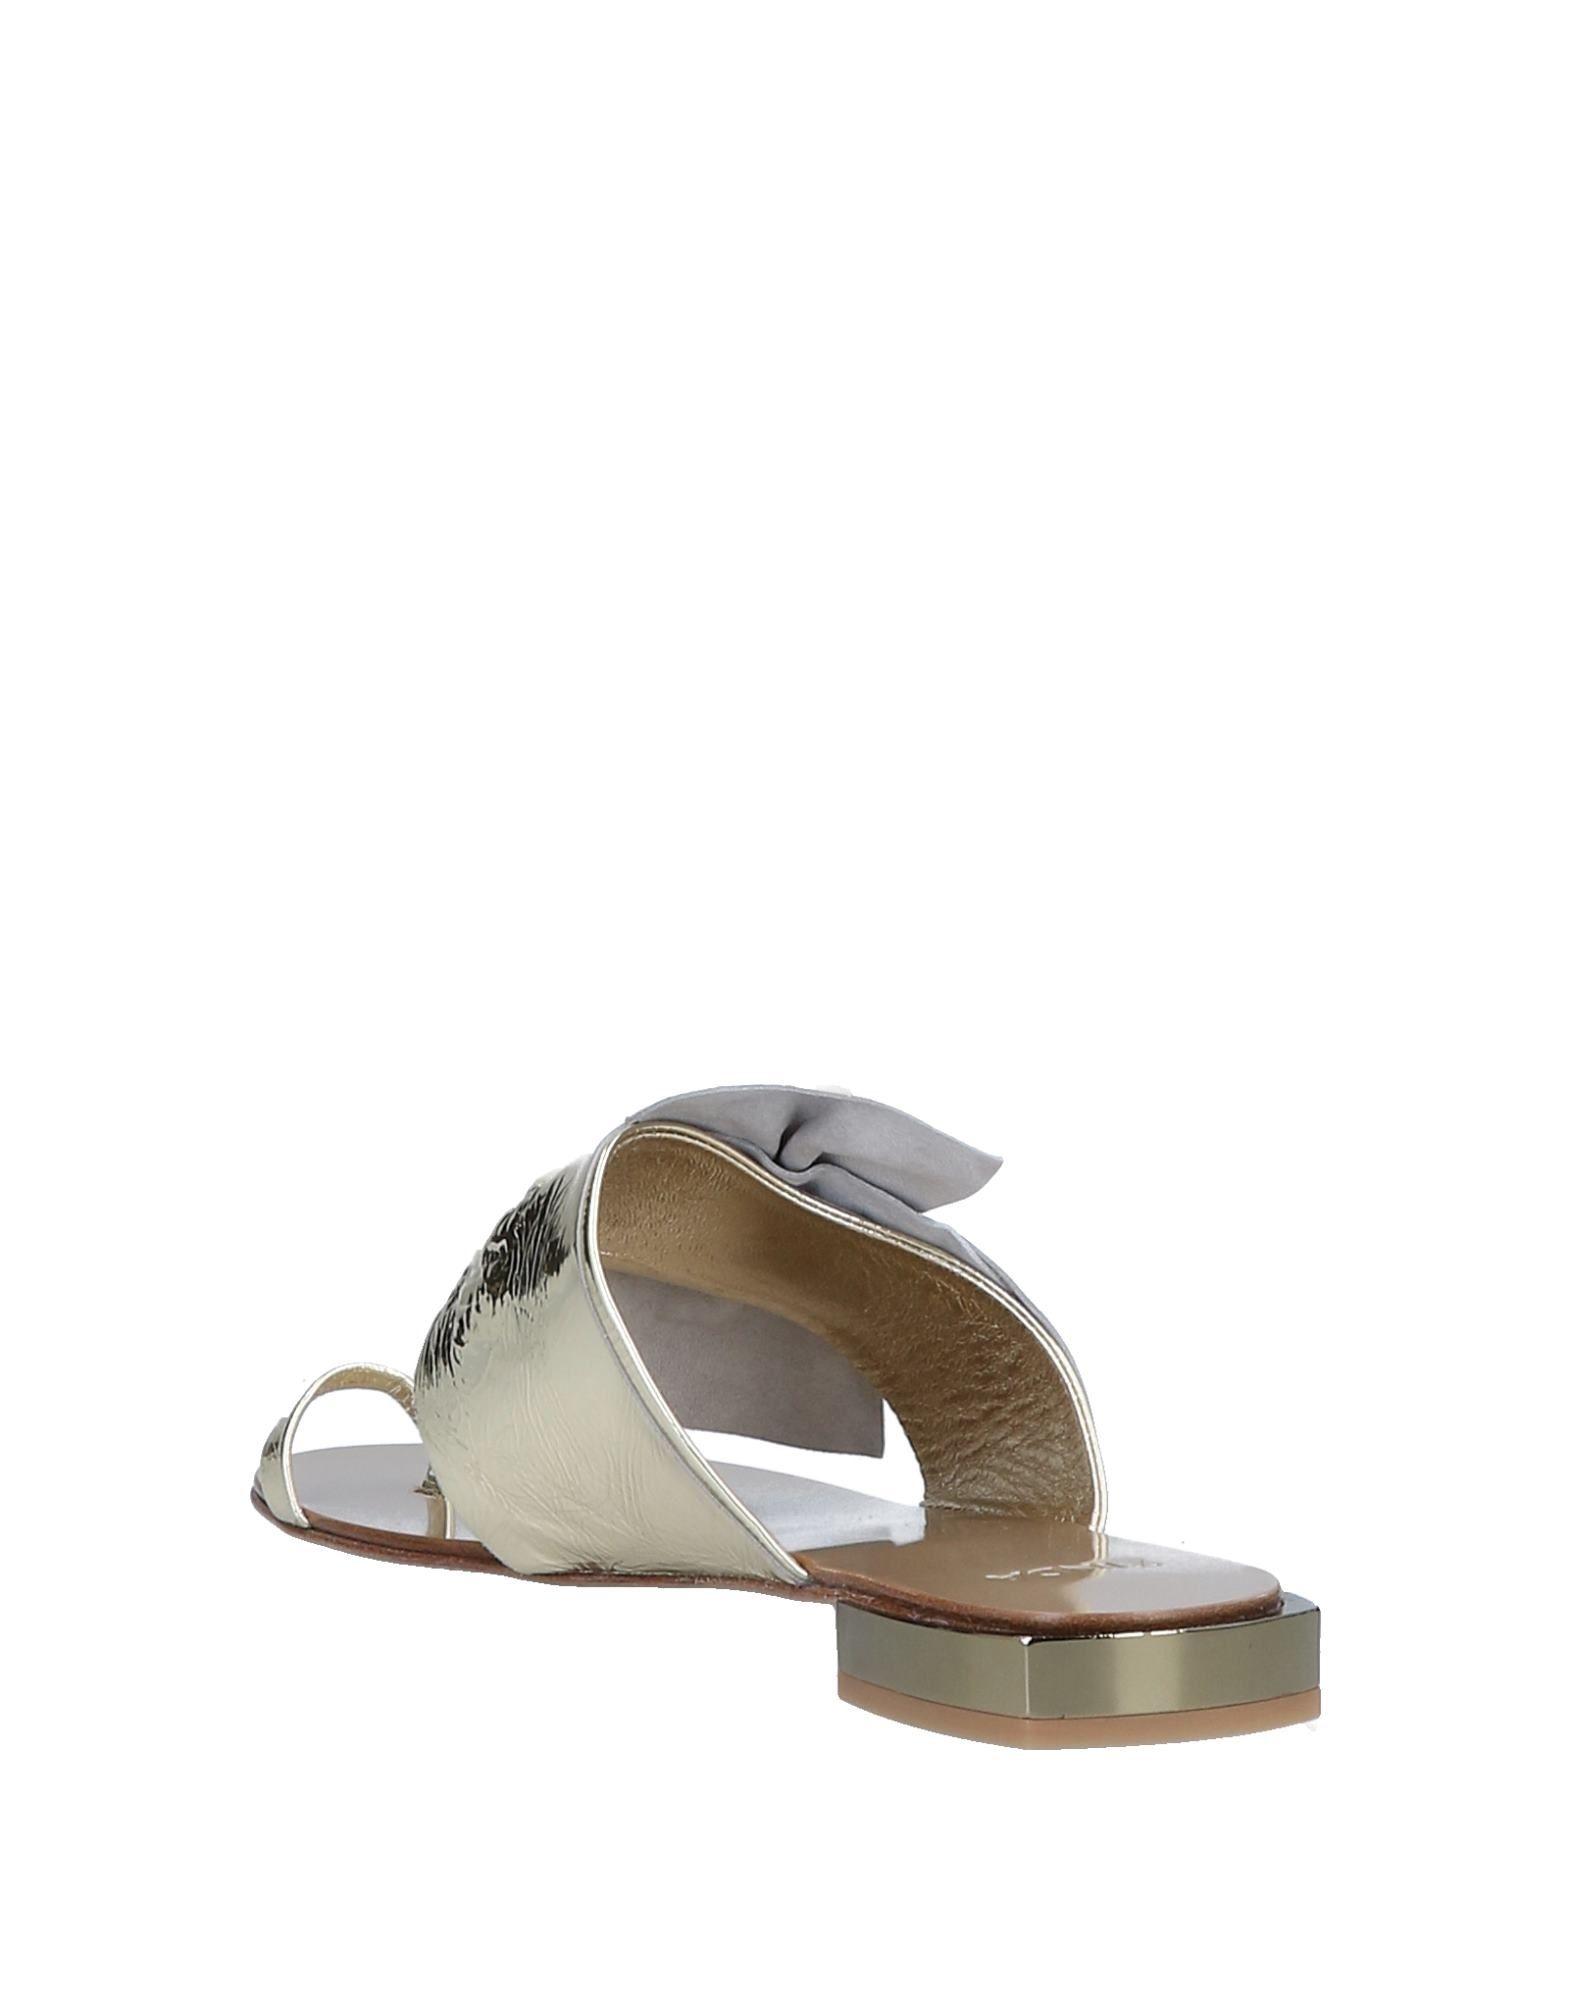 Zinda 11563215BS Dianetten Damen  11563215BS Zinda Gute Qualität beliebte Schuhe 04aff3